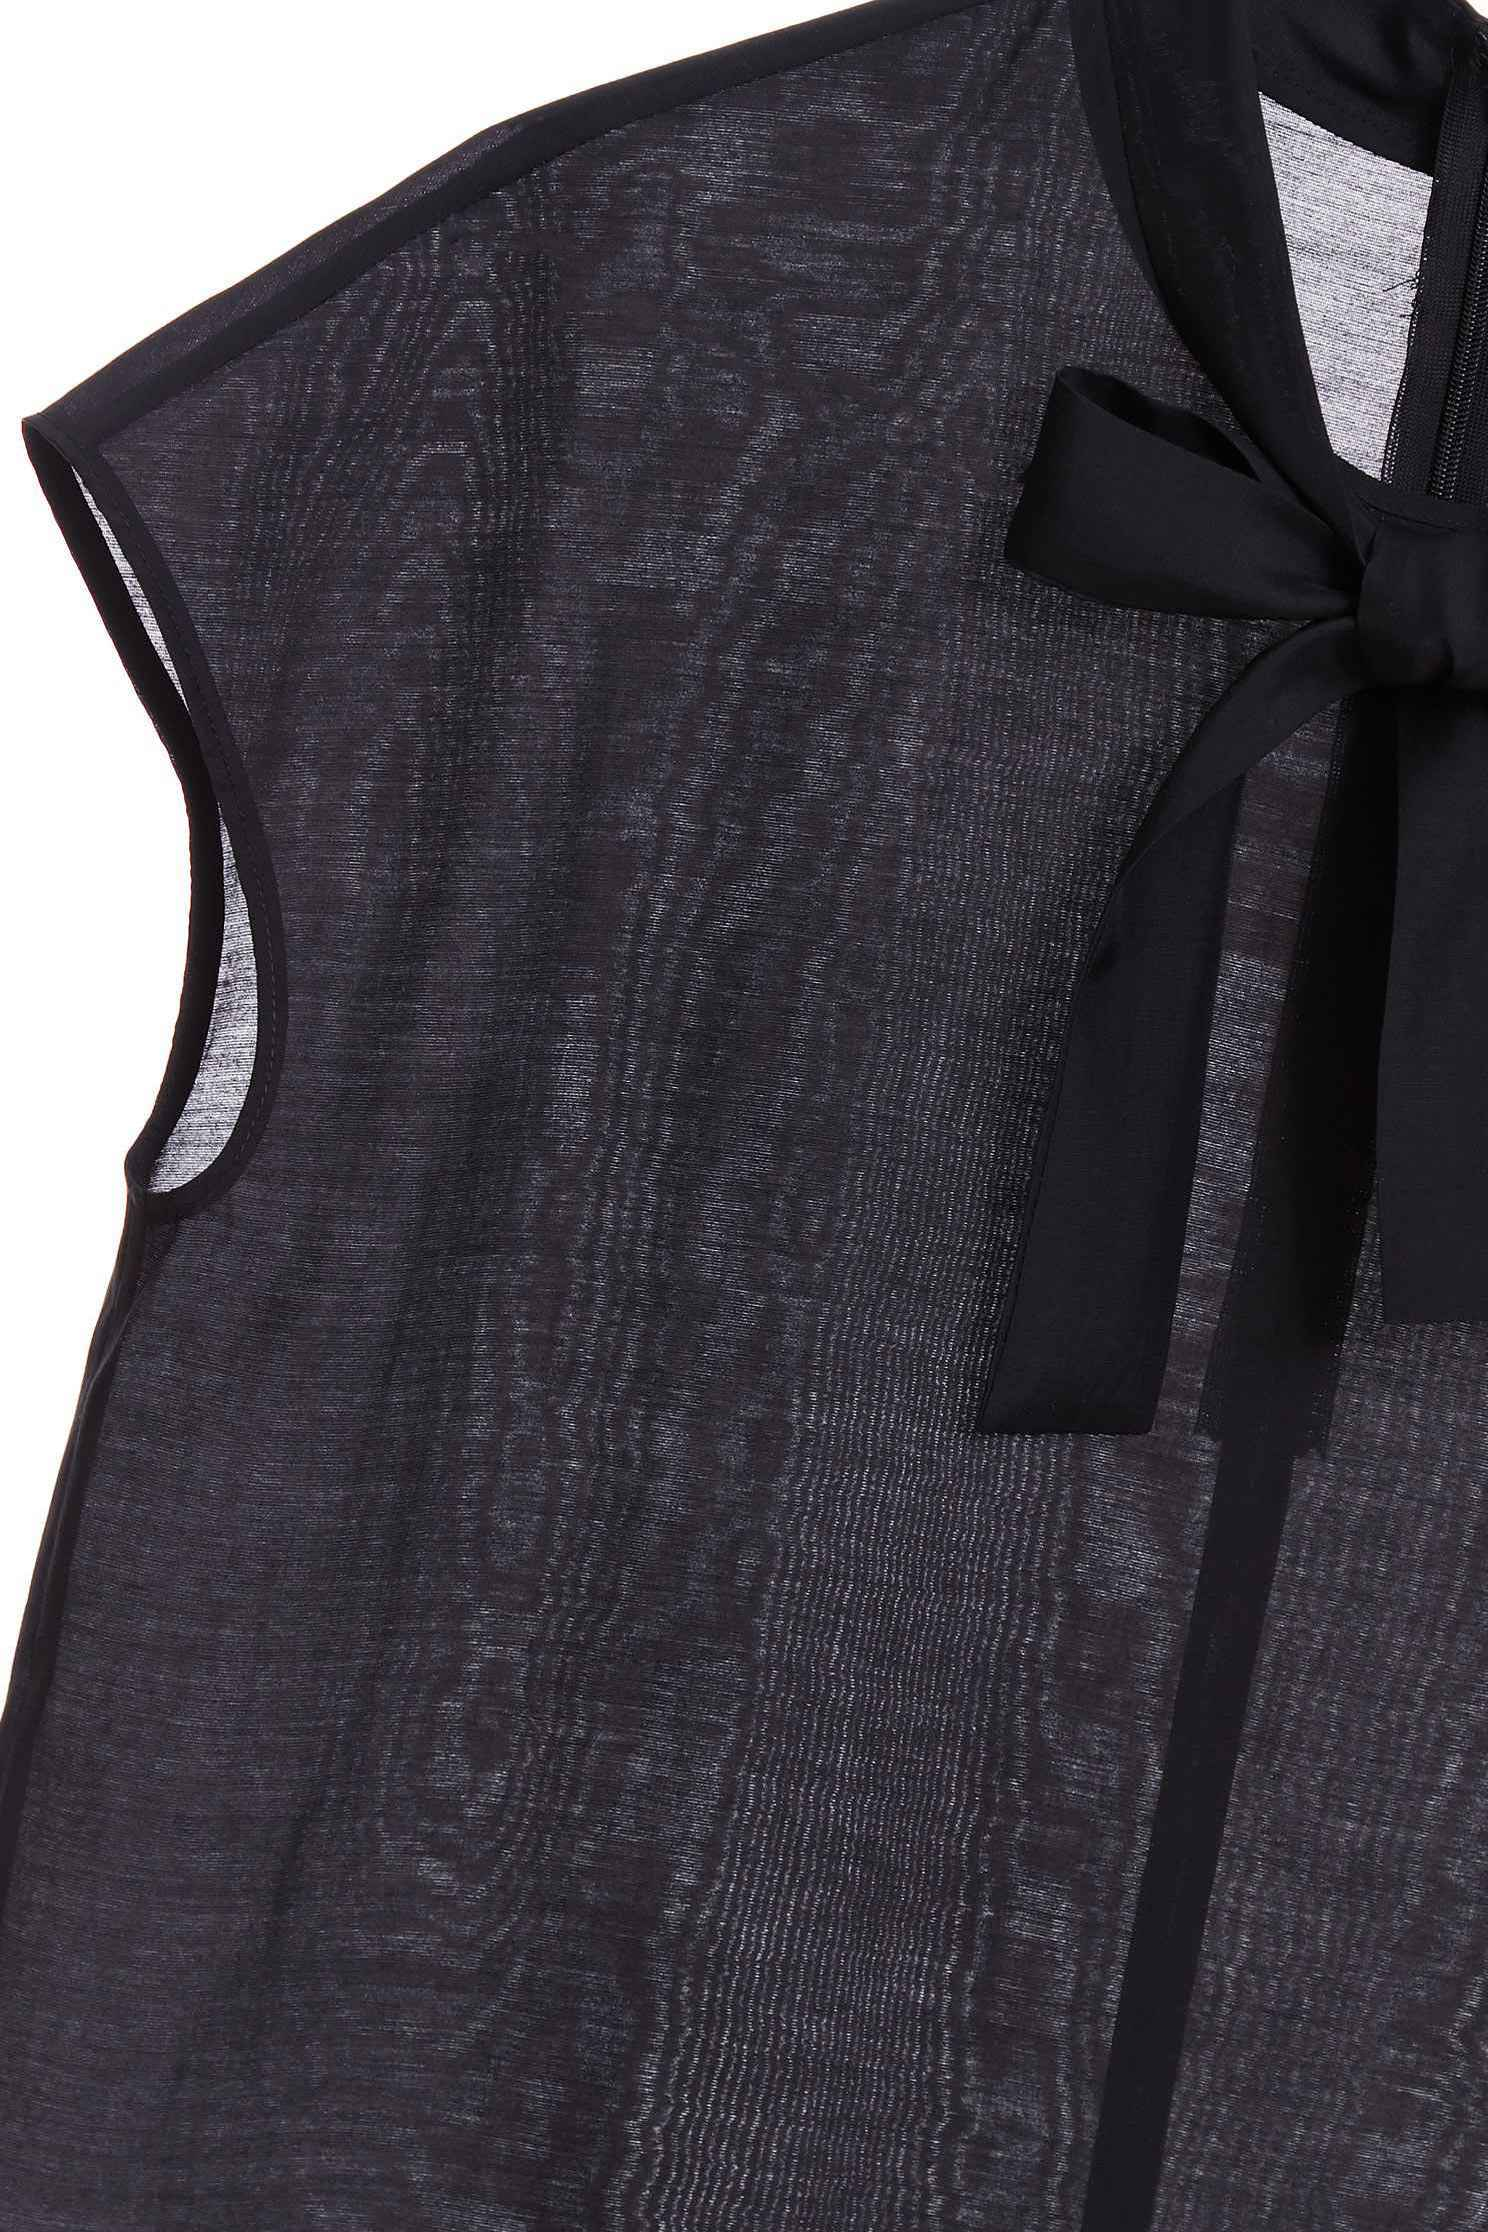 Front collar strap top,top,shortsleevetop,i-select,blacktop